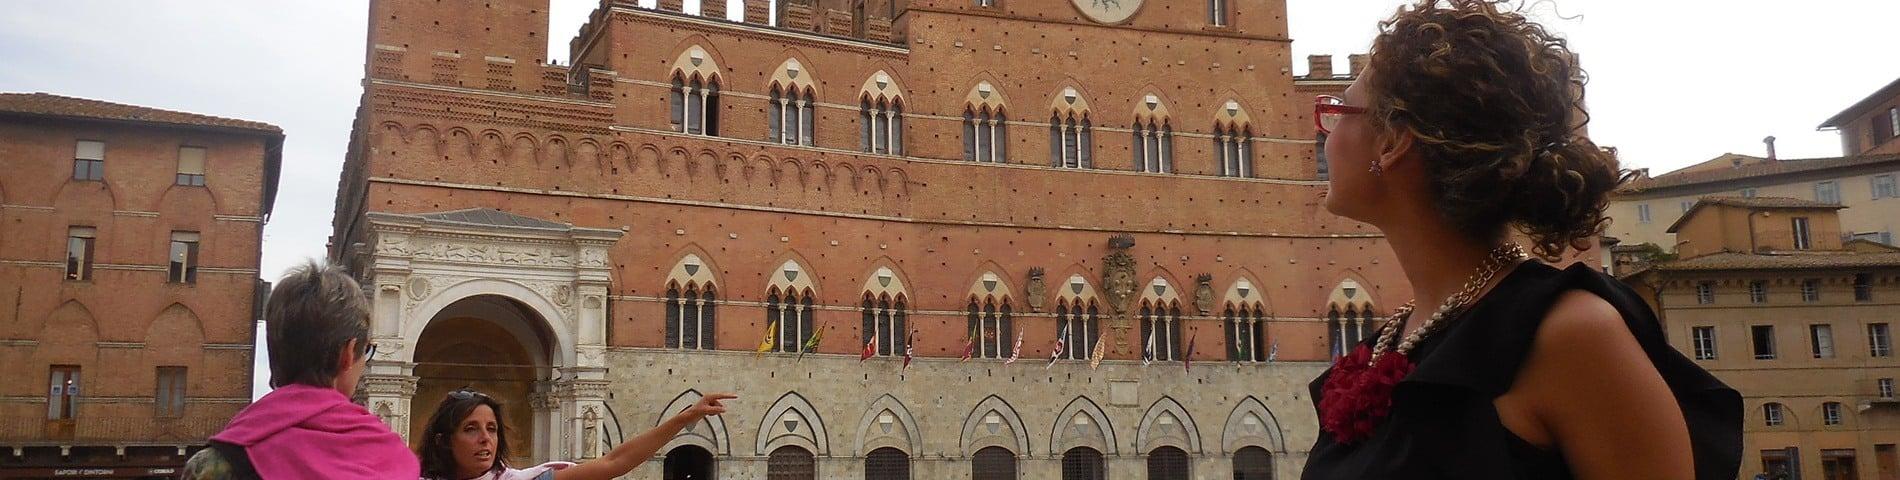 Scuola Leonardo da Vinci photo 1